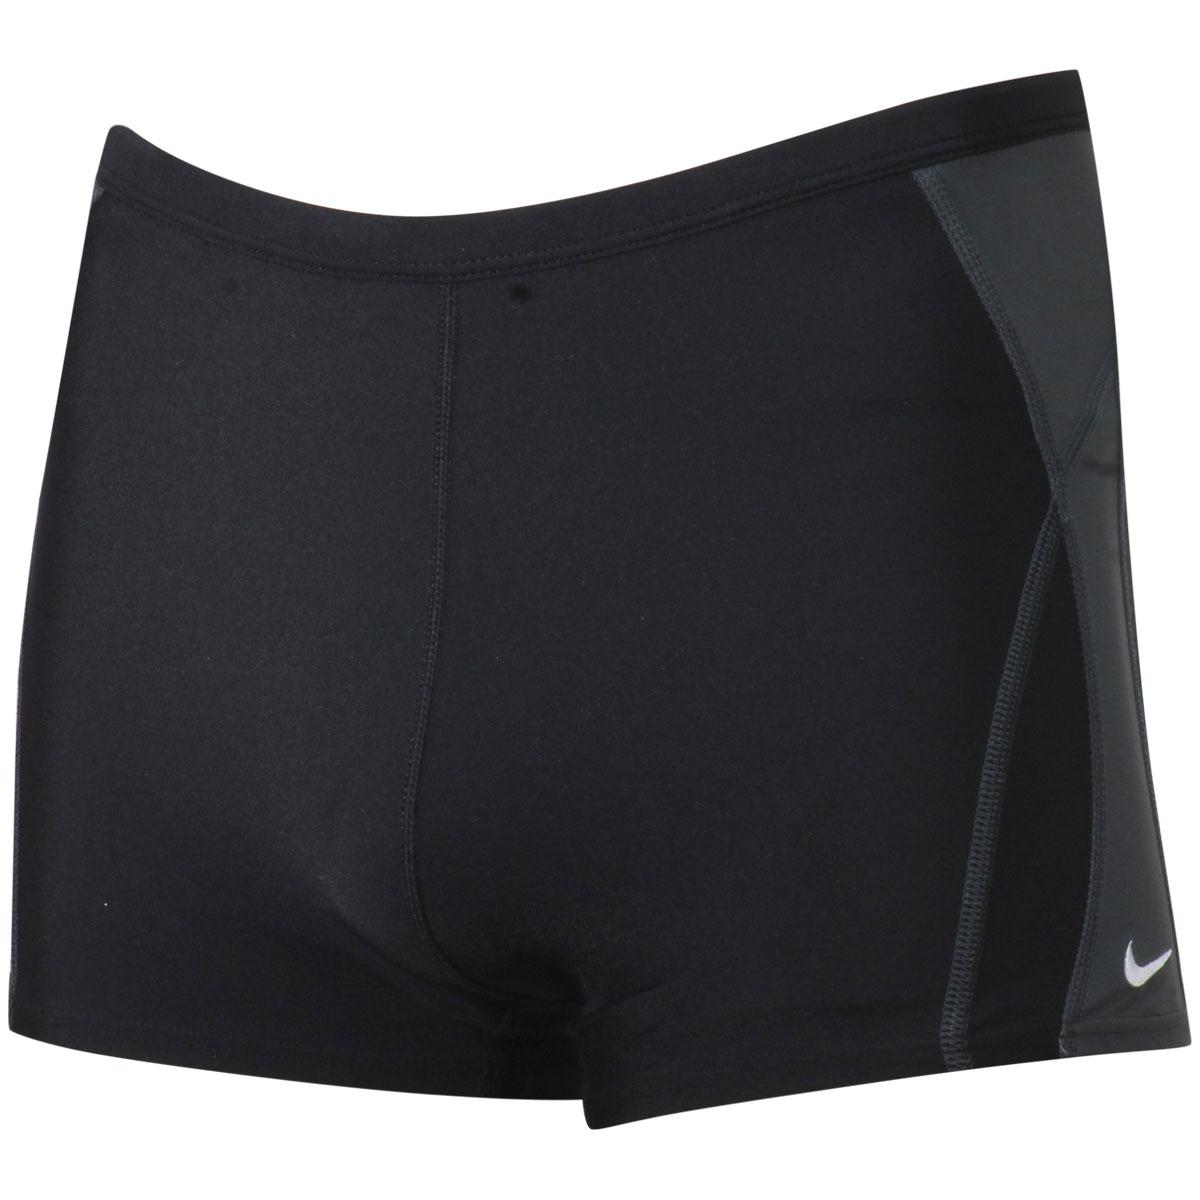 d8ef85c5d5 Nike Men's Poly Core Solids Square Leg Performance Swimwear   eBay